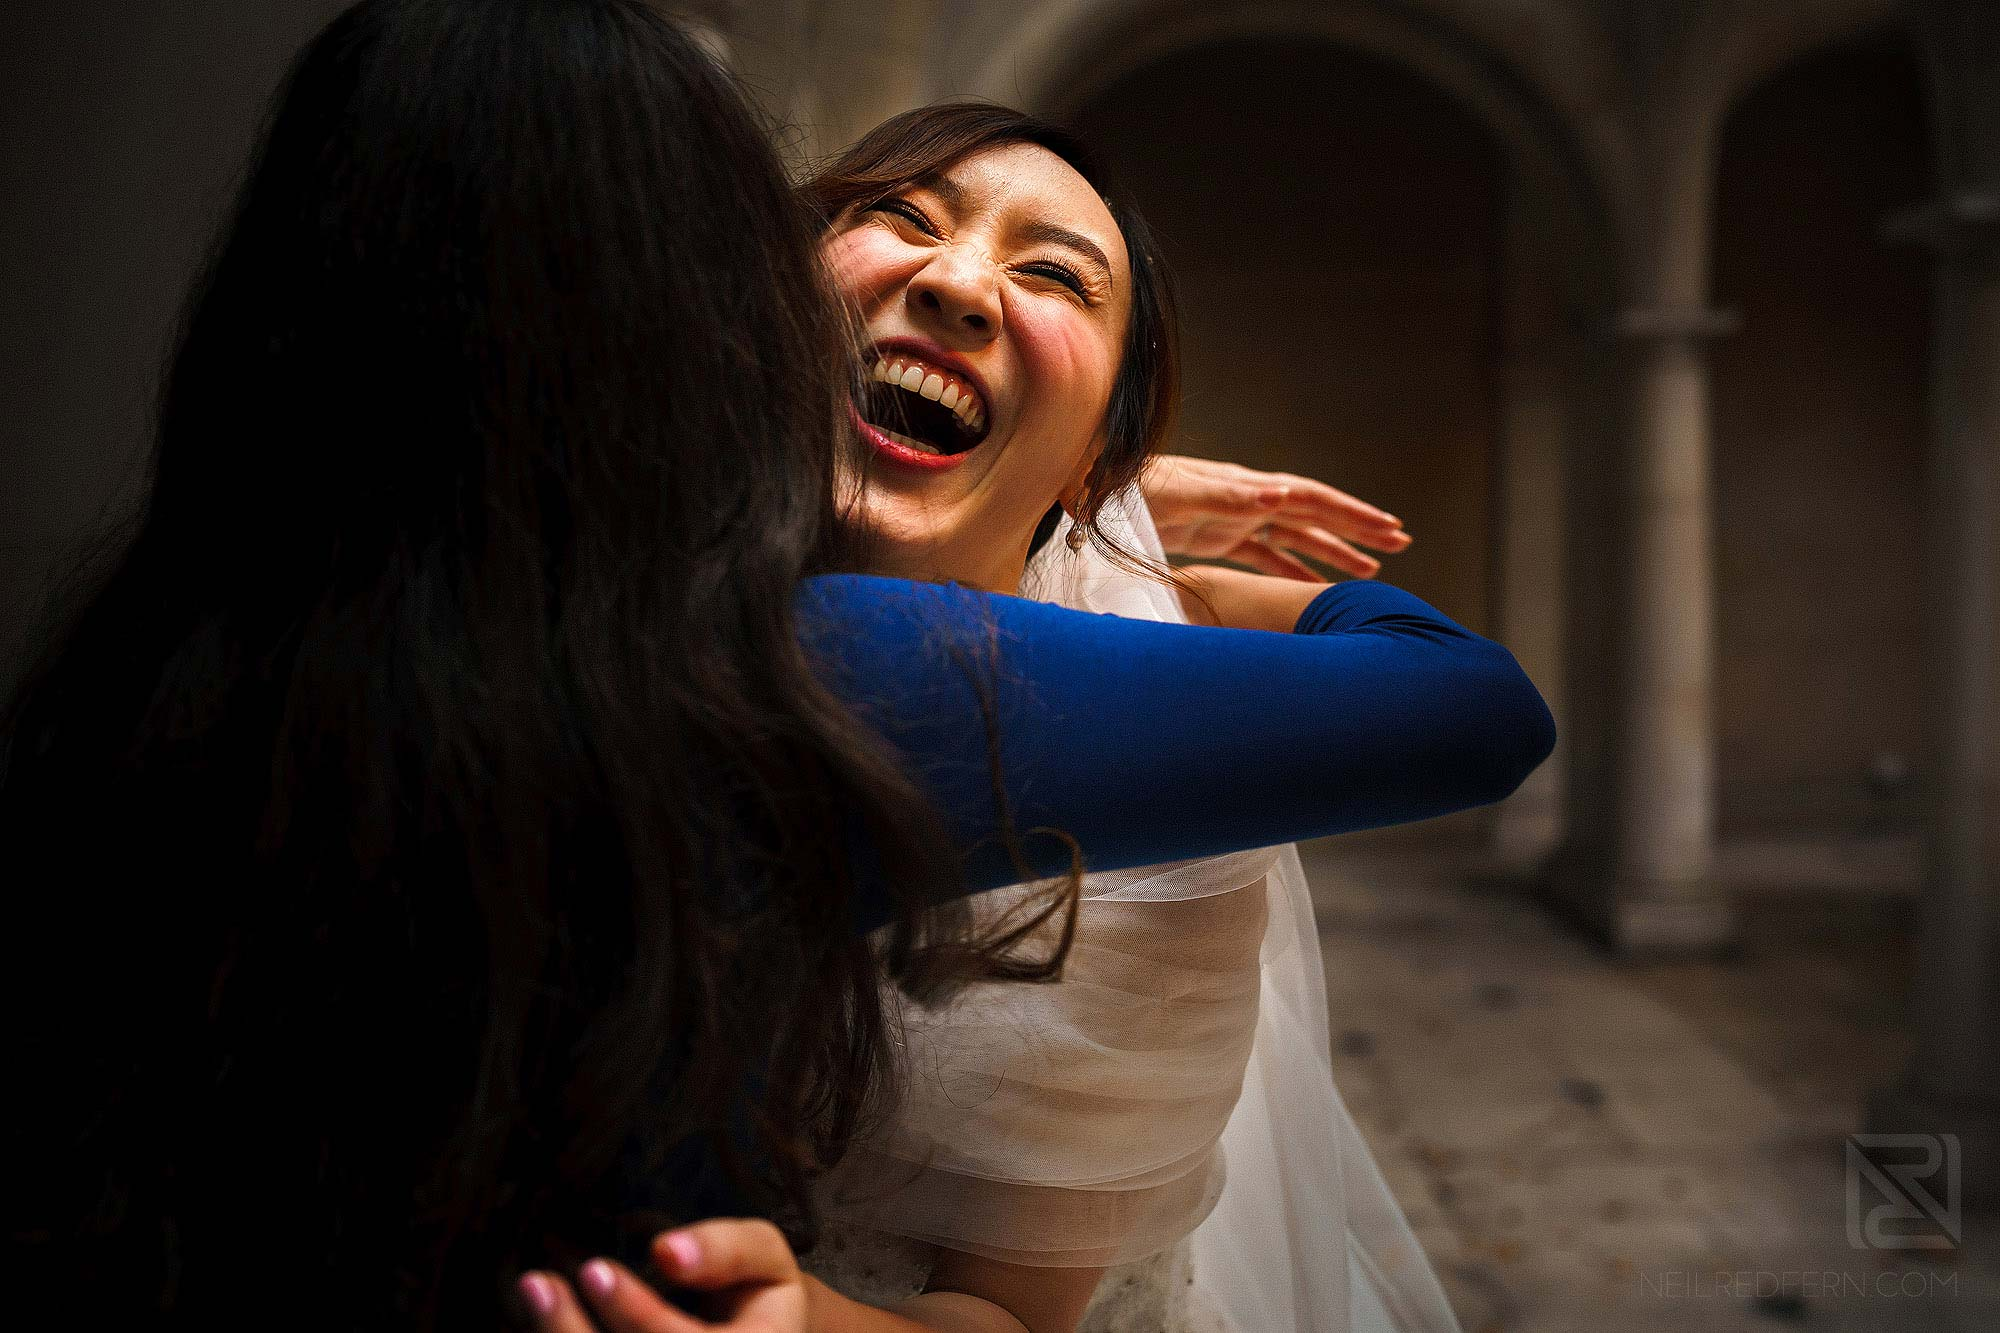 happy bride hugging friend after wedding ceremony